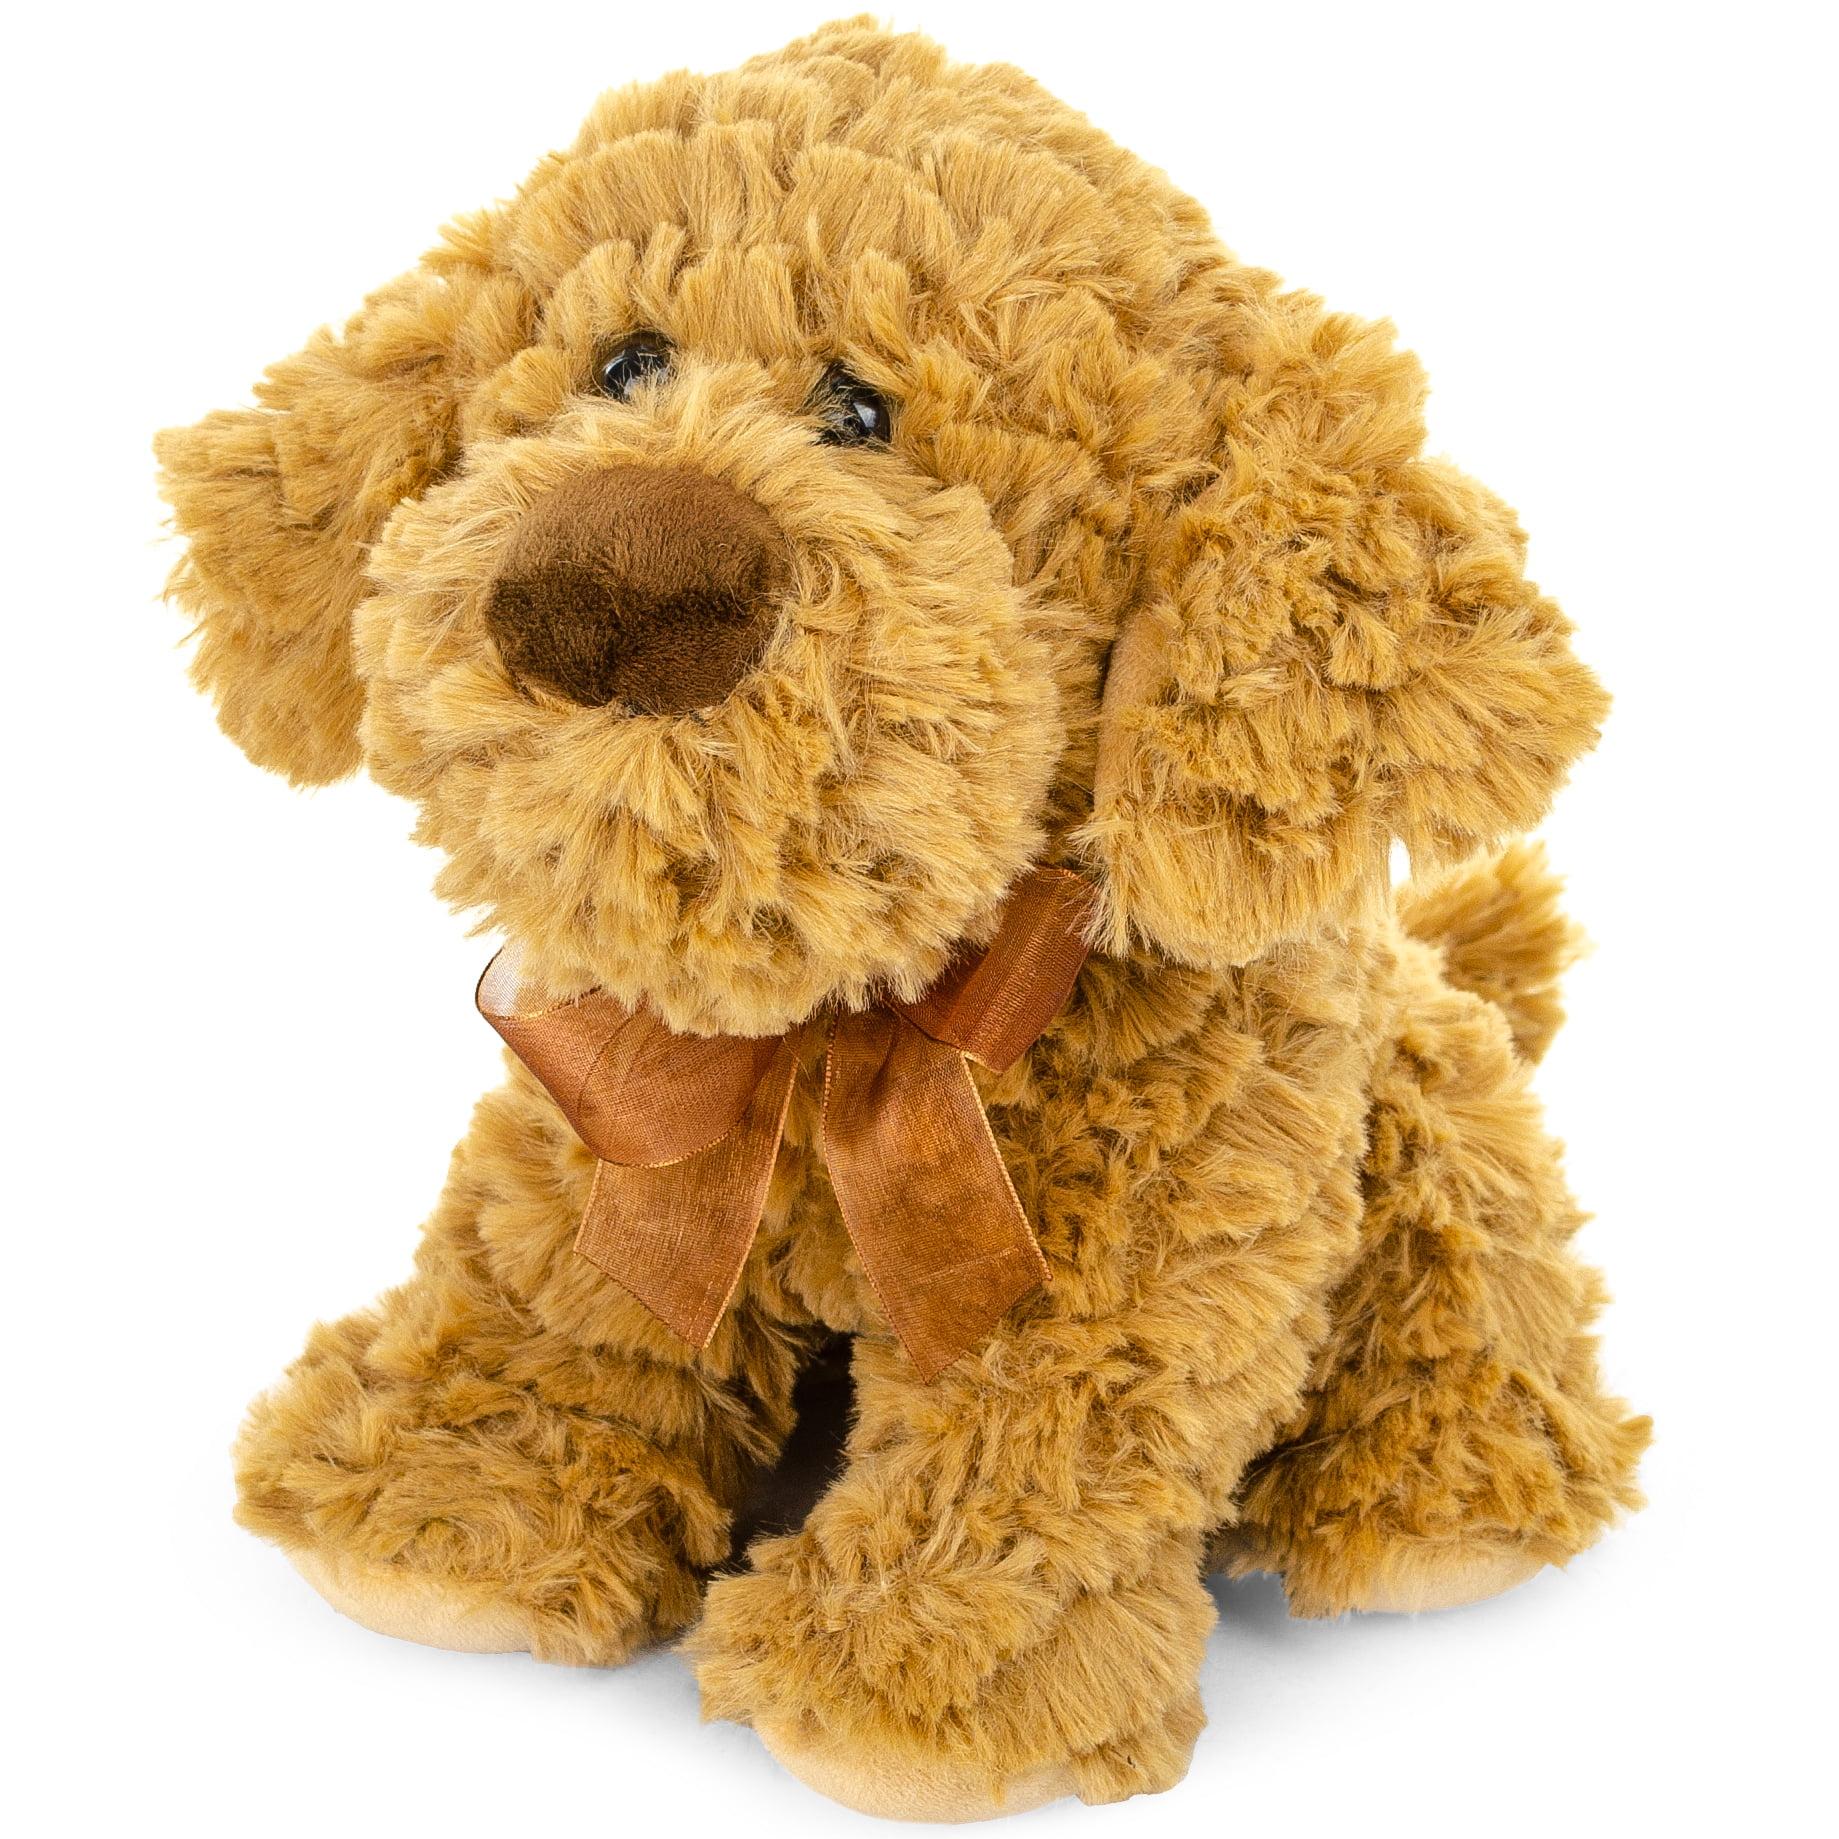 Plush Sitting Shaggy Cockapoo Dog Stuffed Animal Toy